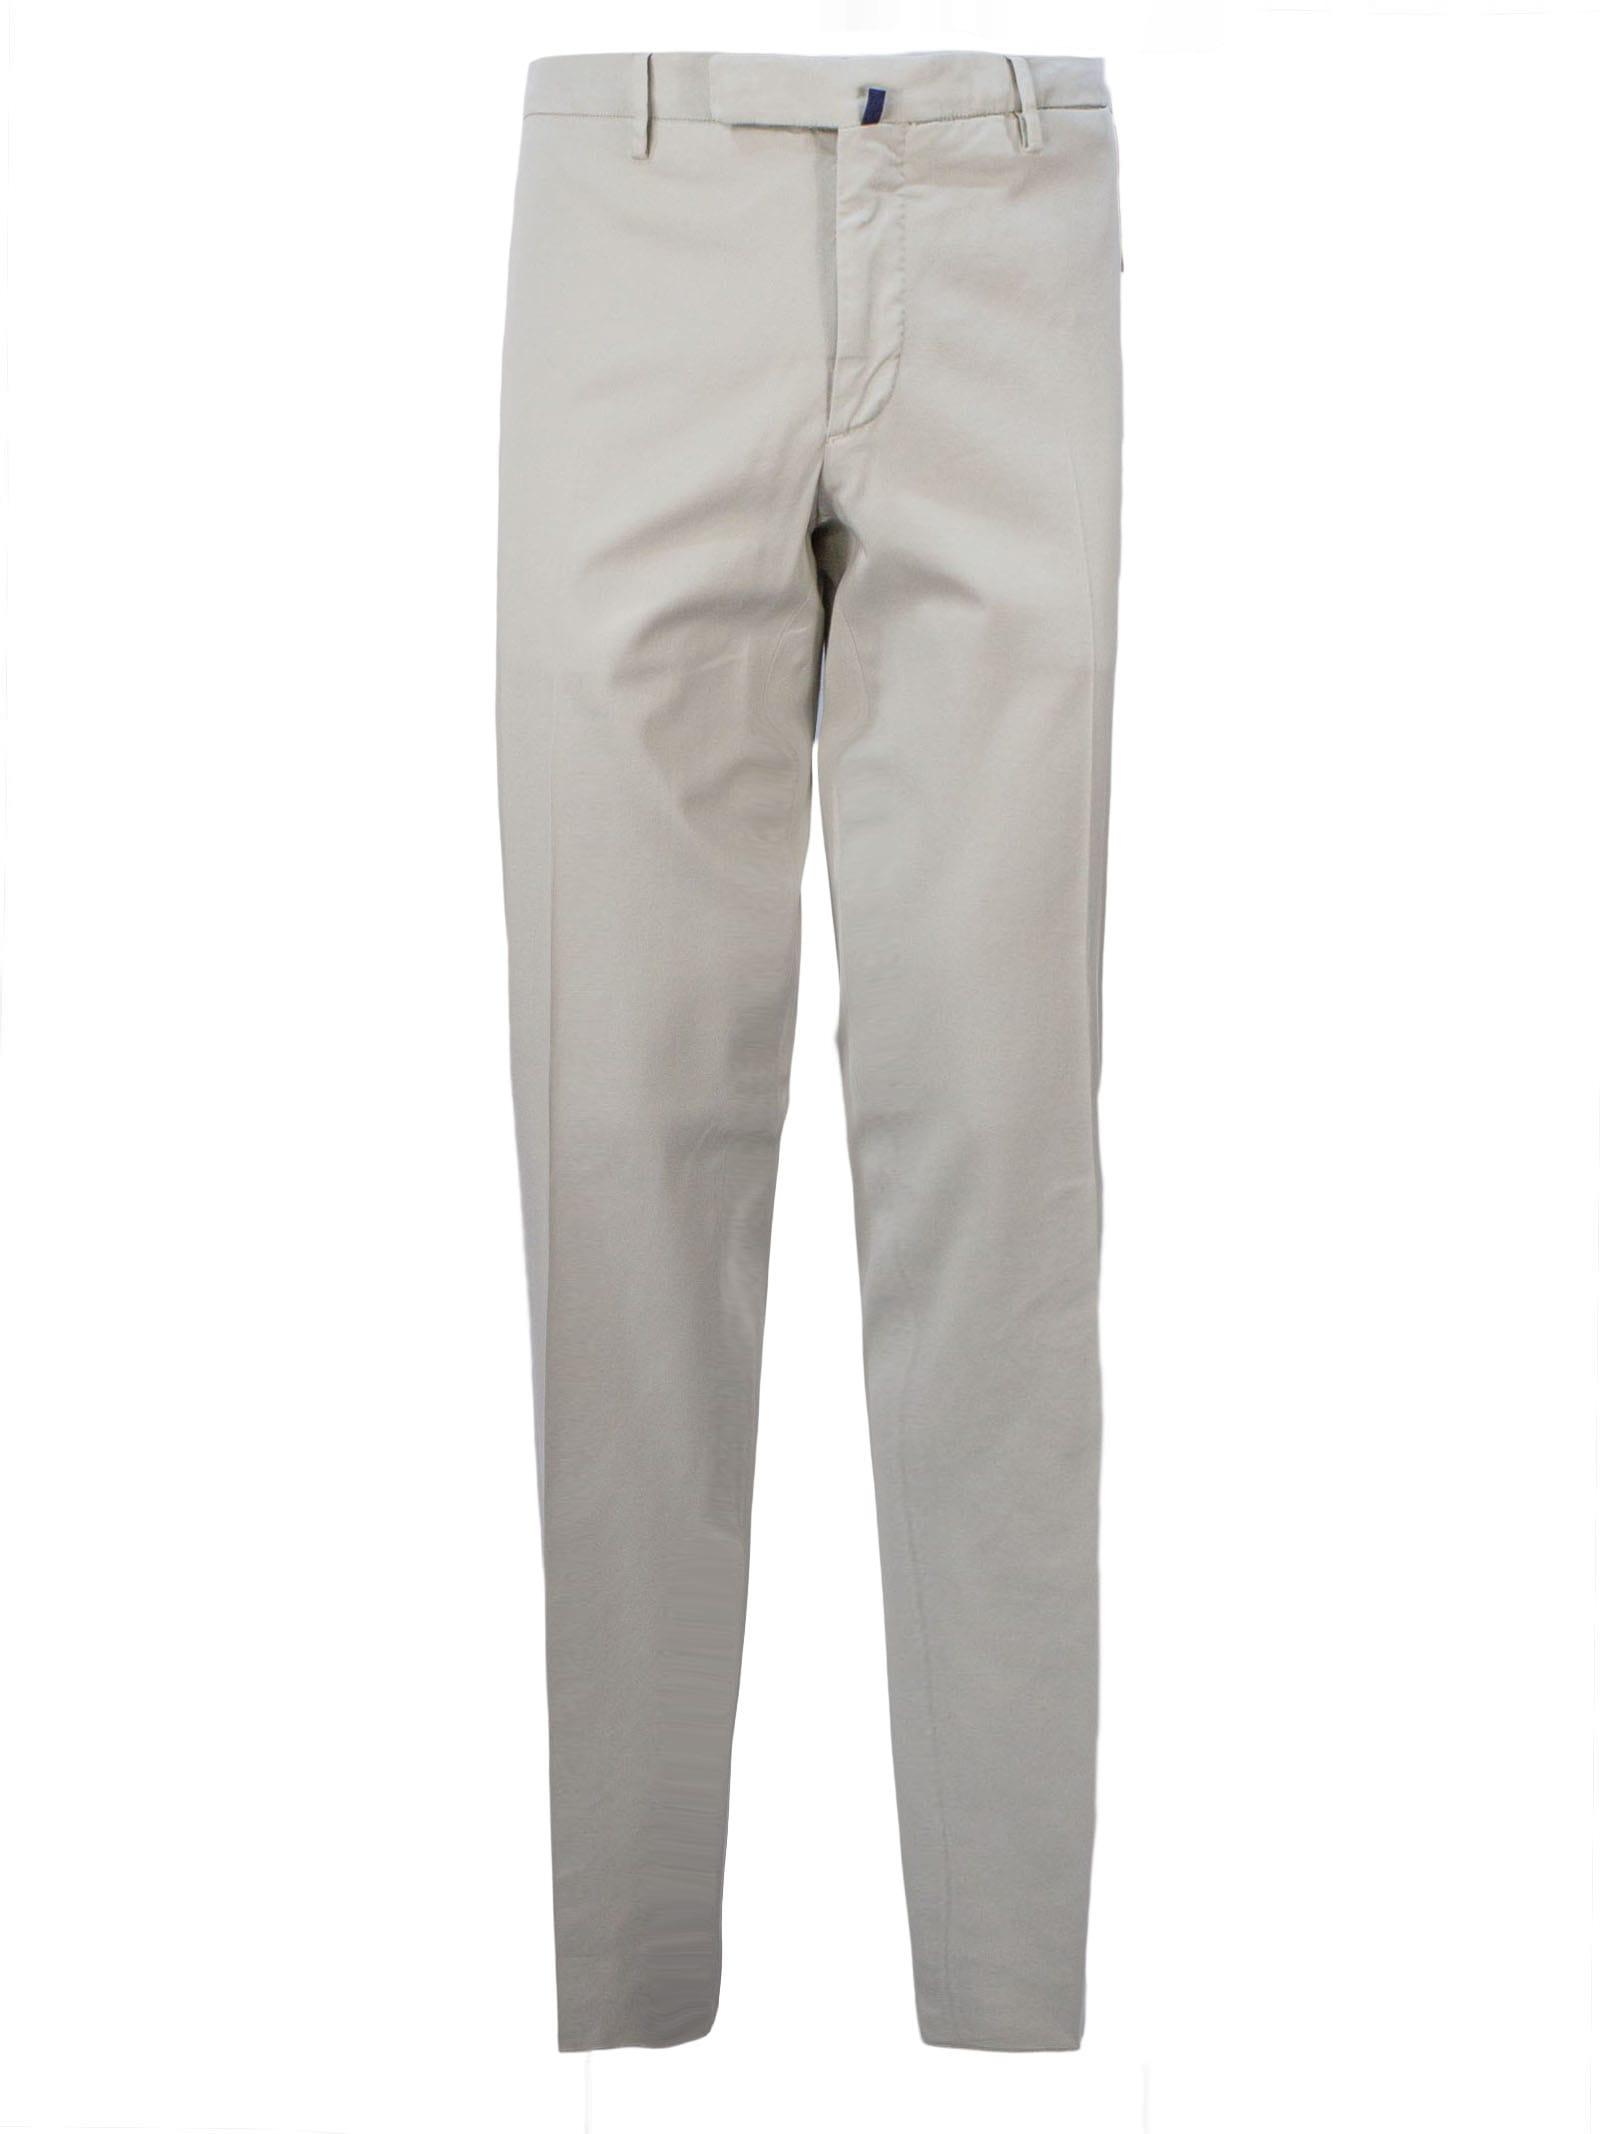 Incotex Beige Cotton Blend Chino Trouser